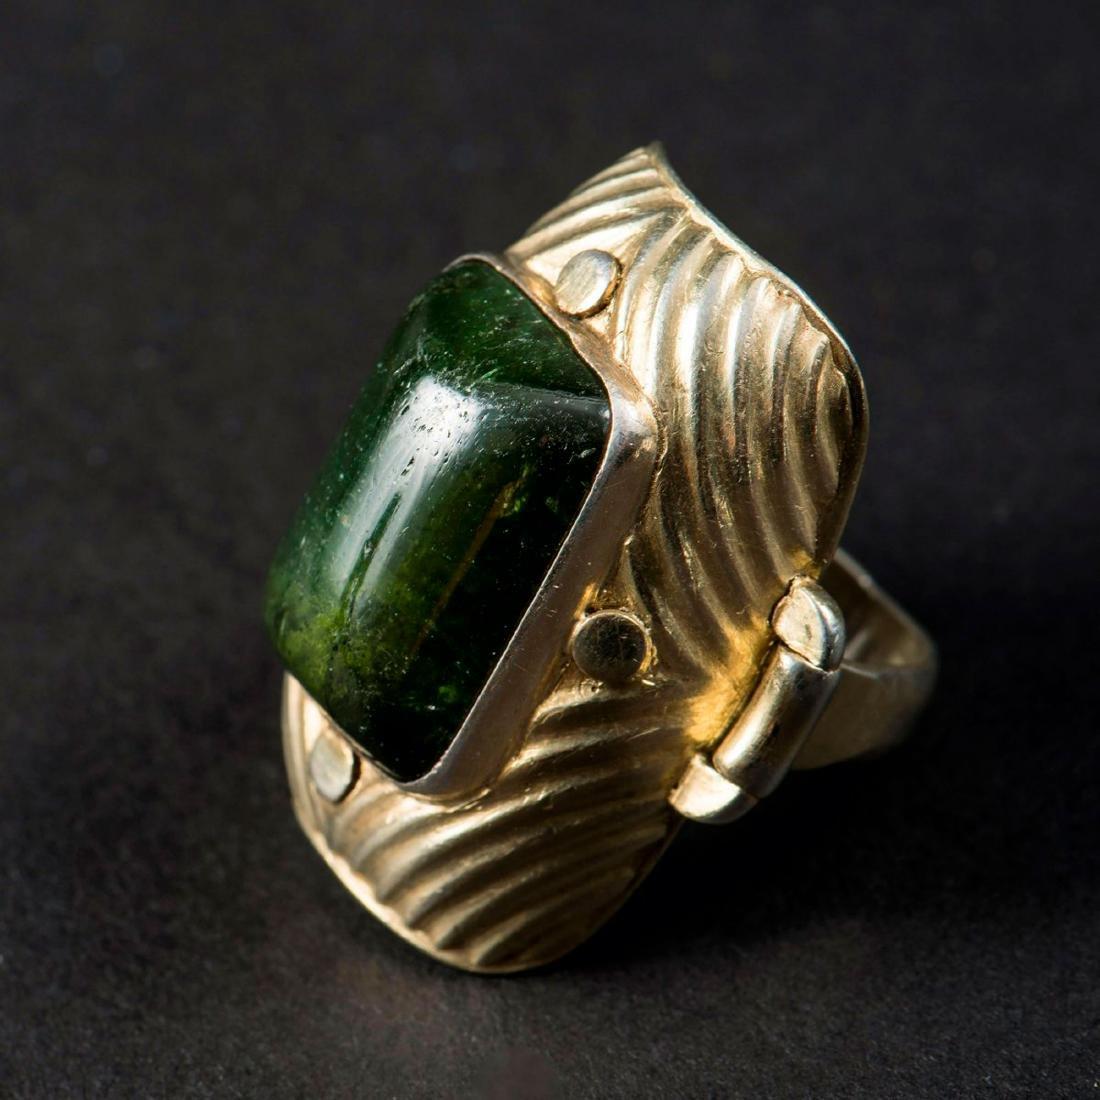 Ring, c. 1950